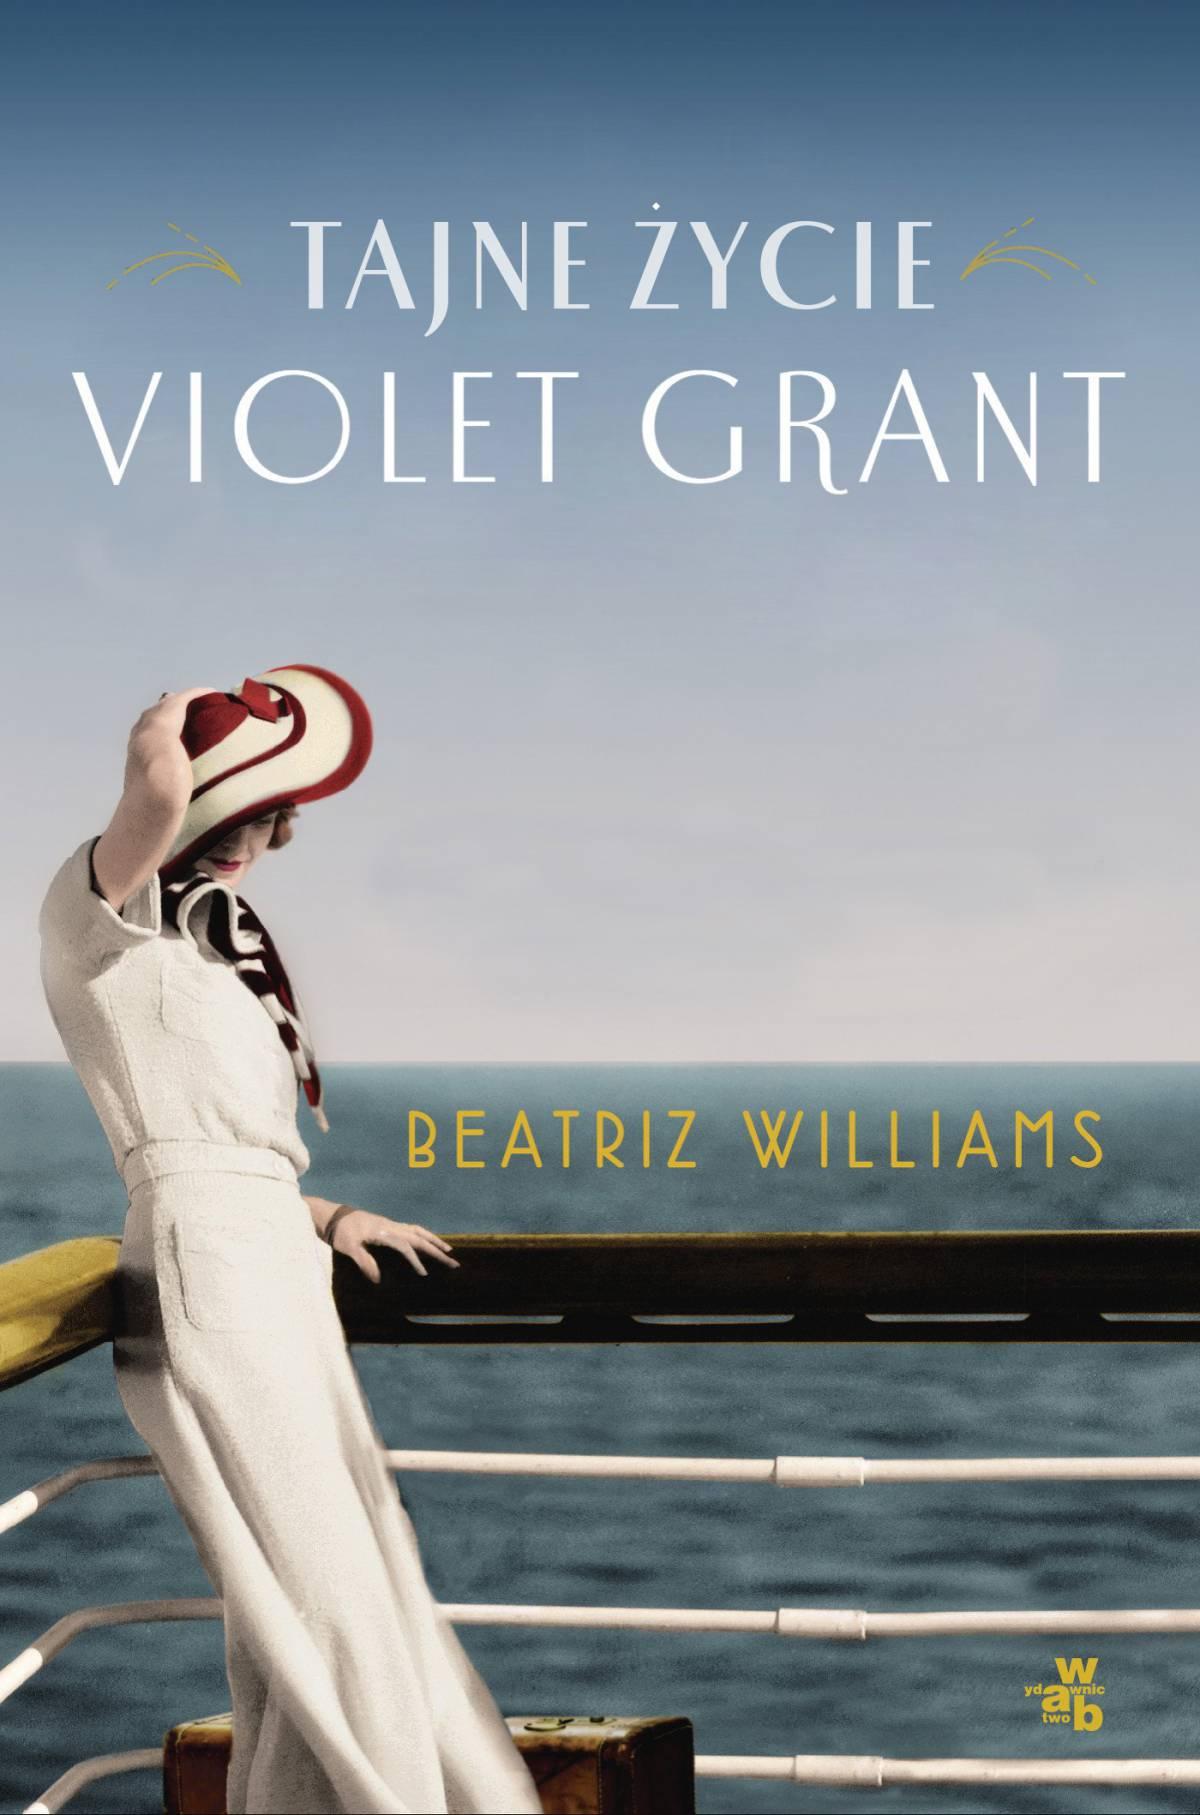 Tajne życie Violet Grant - Ebook (Książka na Kindle) do pobrania w formacie MOBI